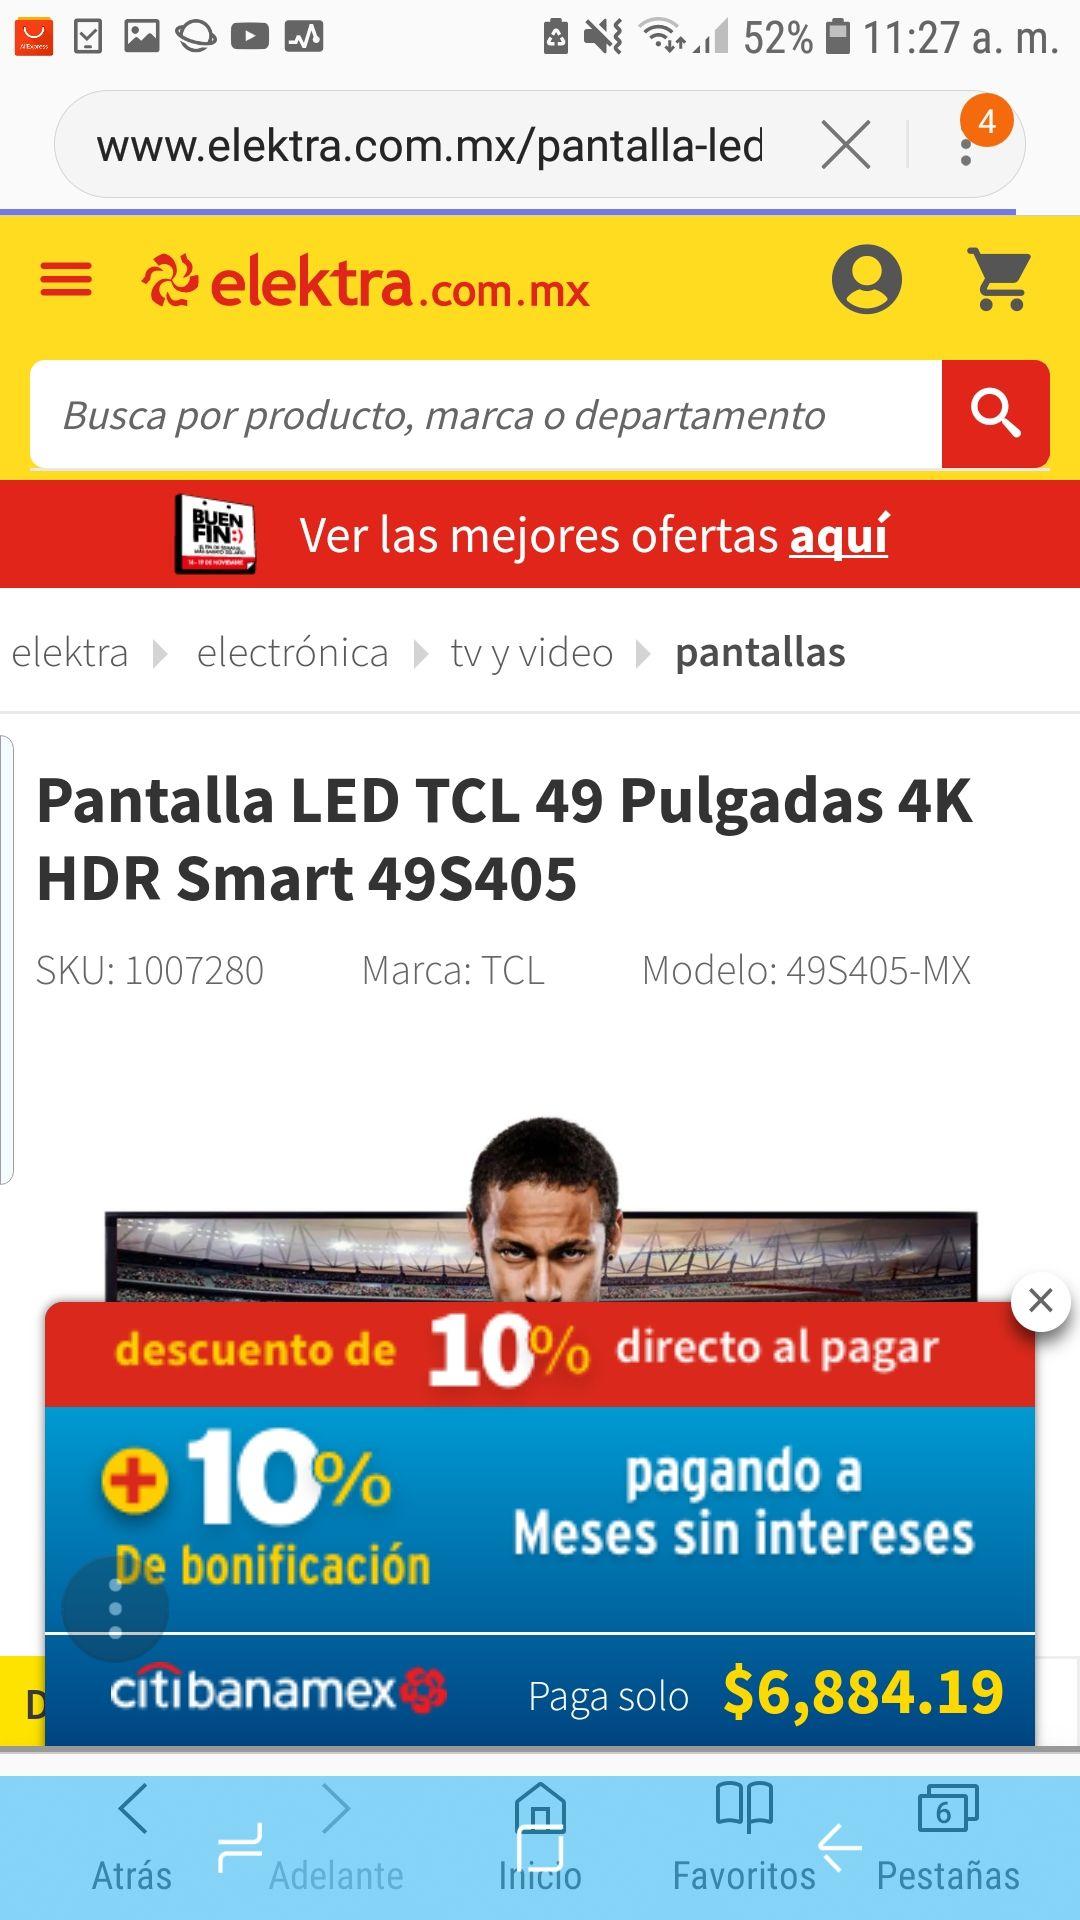 Buen Fin 2018 en Elektra: Pantalla LED TCL 49 '' 4K HDR Smart 49S405 Pagando con Citibanamex